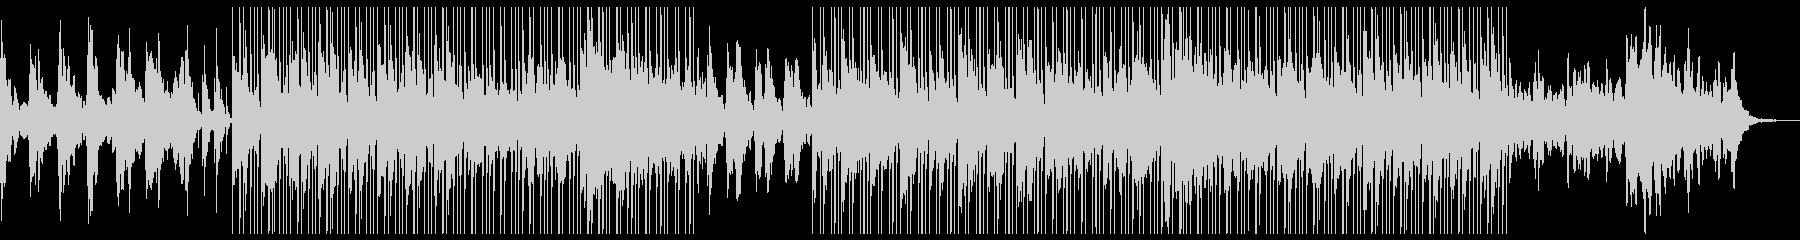 Lofi ノスタルジック 古いオルゴールの未再生の波形